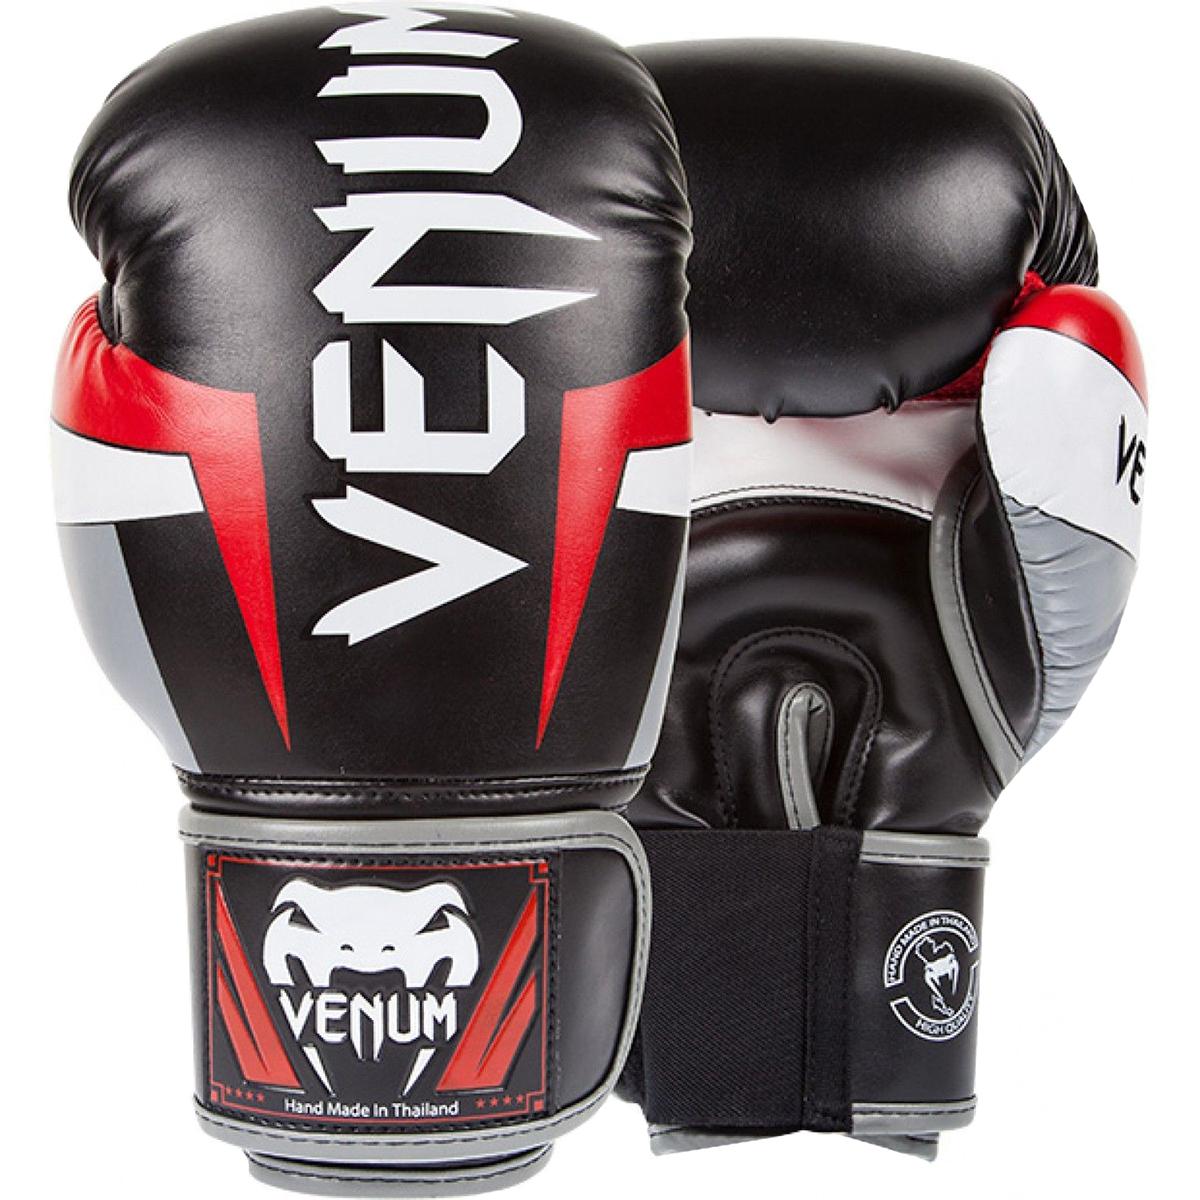 Gray//Black Venum Impact Hook and Loop Training Boxing Gloves